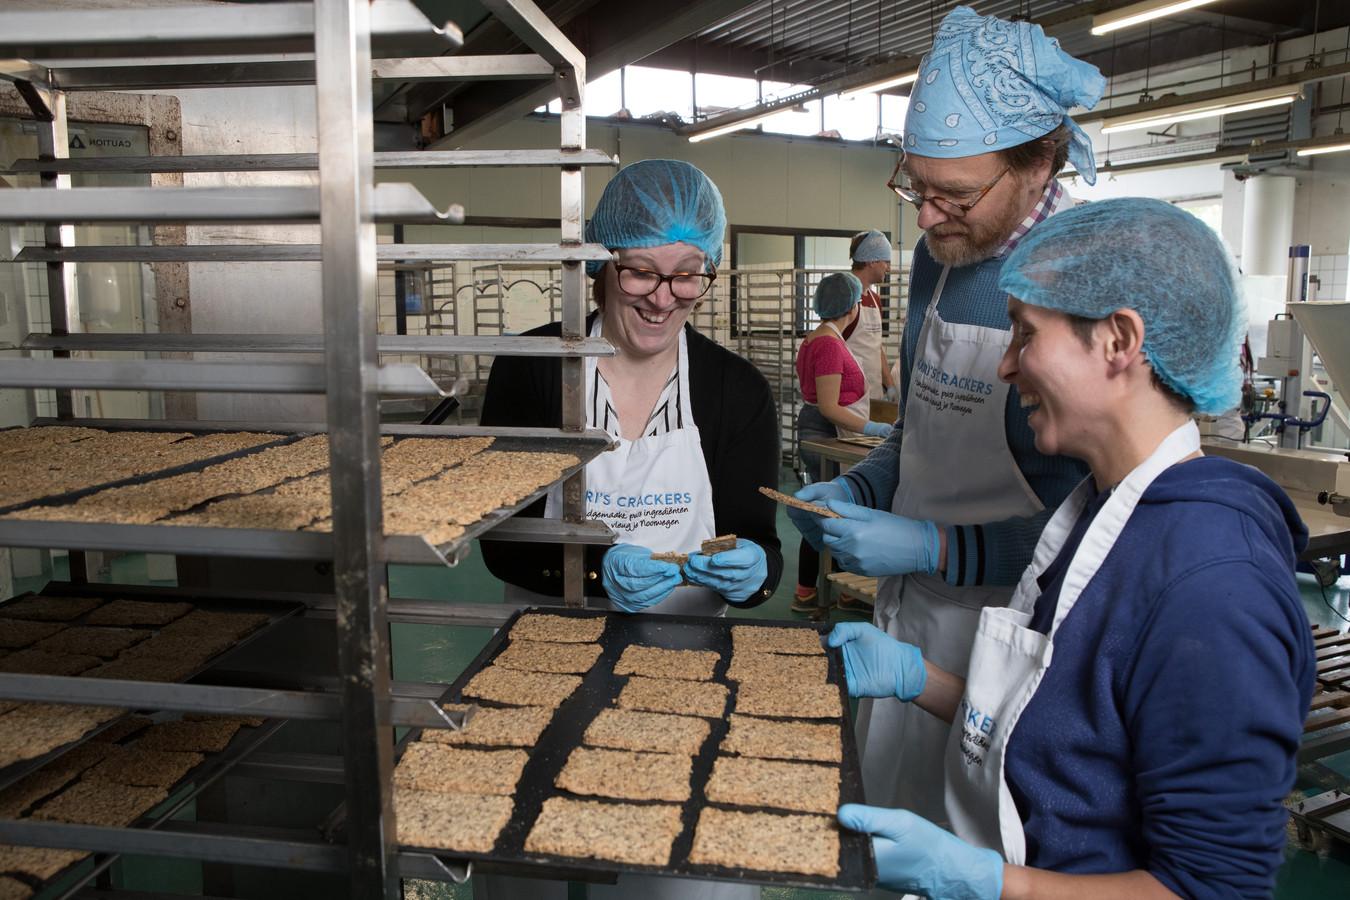 DS-2019-3896 Heino bakkerij Kari`s crackers vlnr Connie van Beusichem, Patrick Roozemond, Katalin Nijland